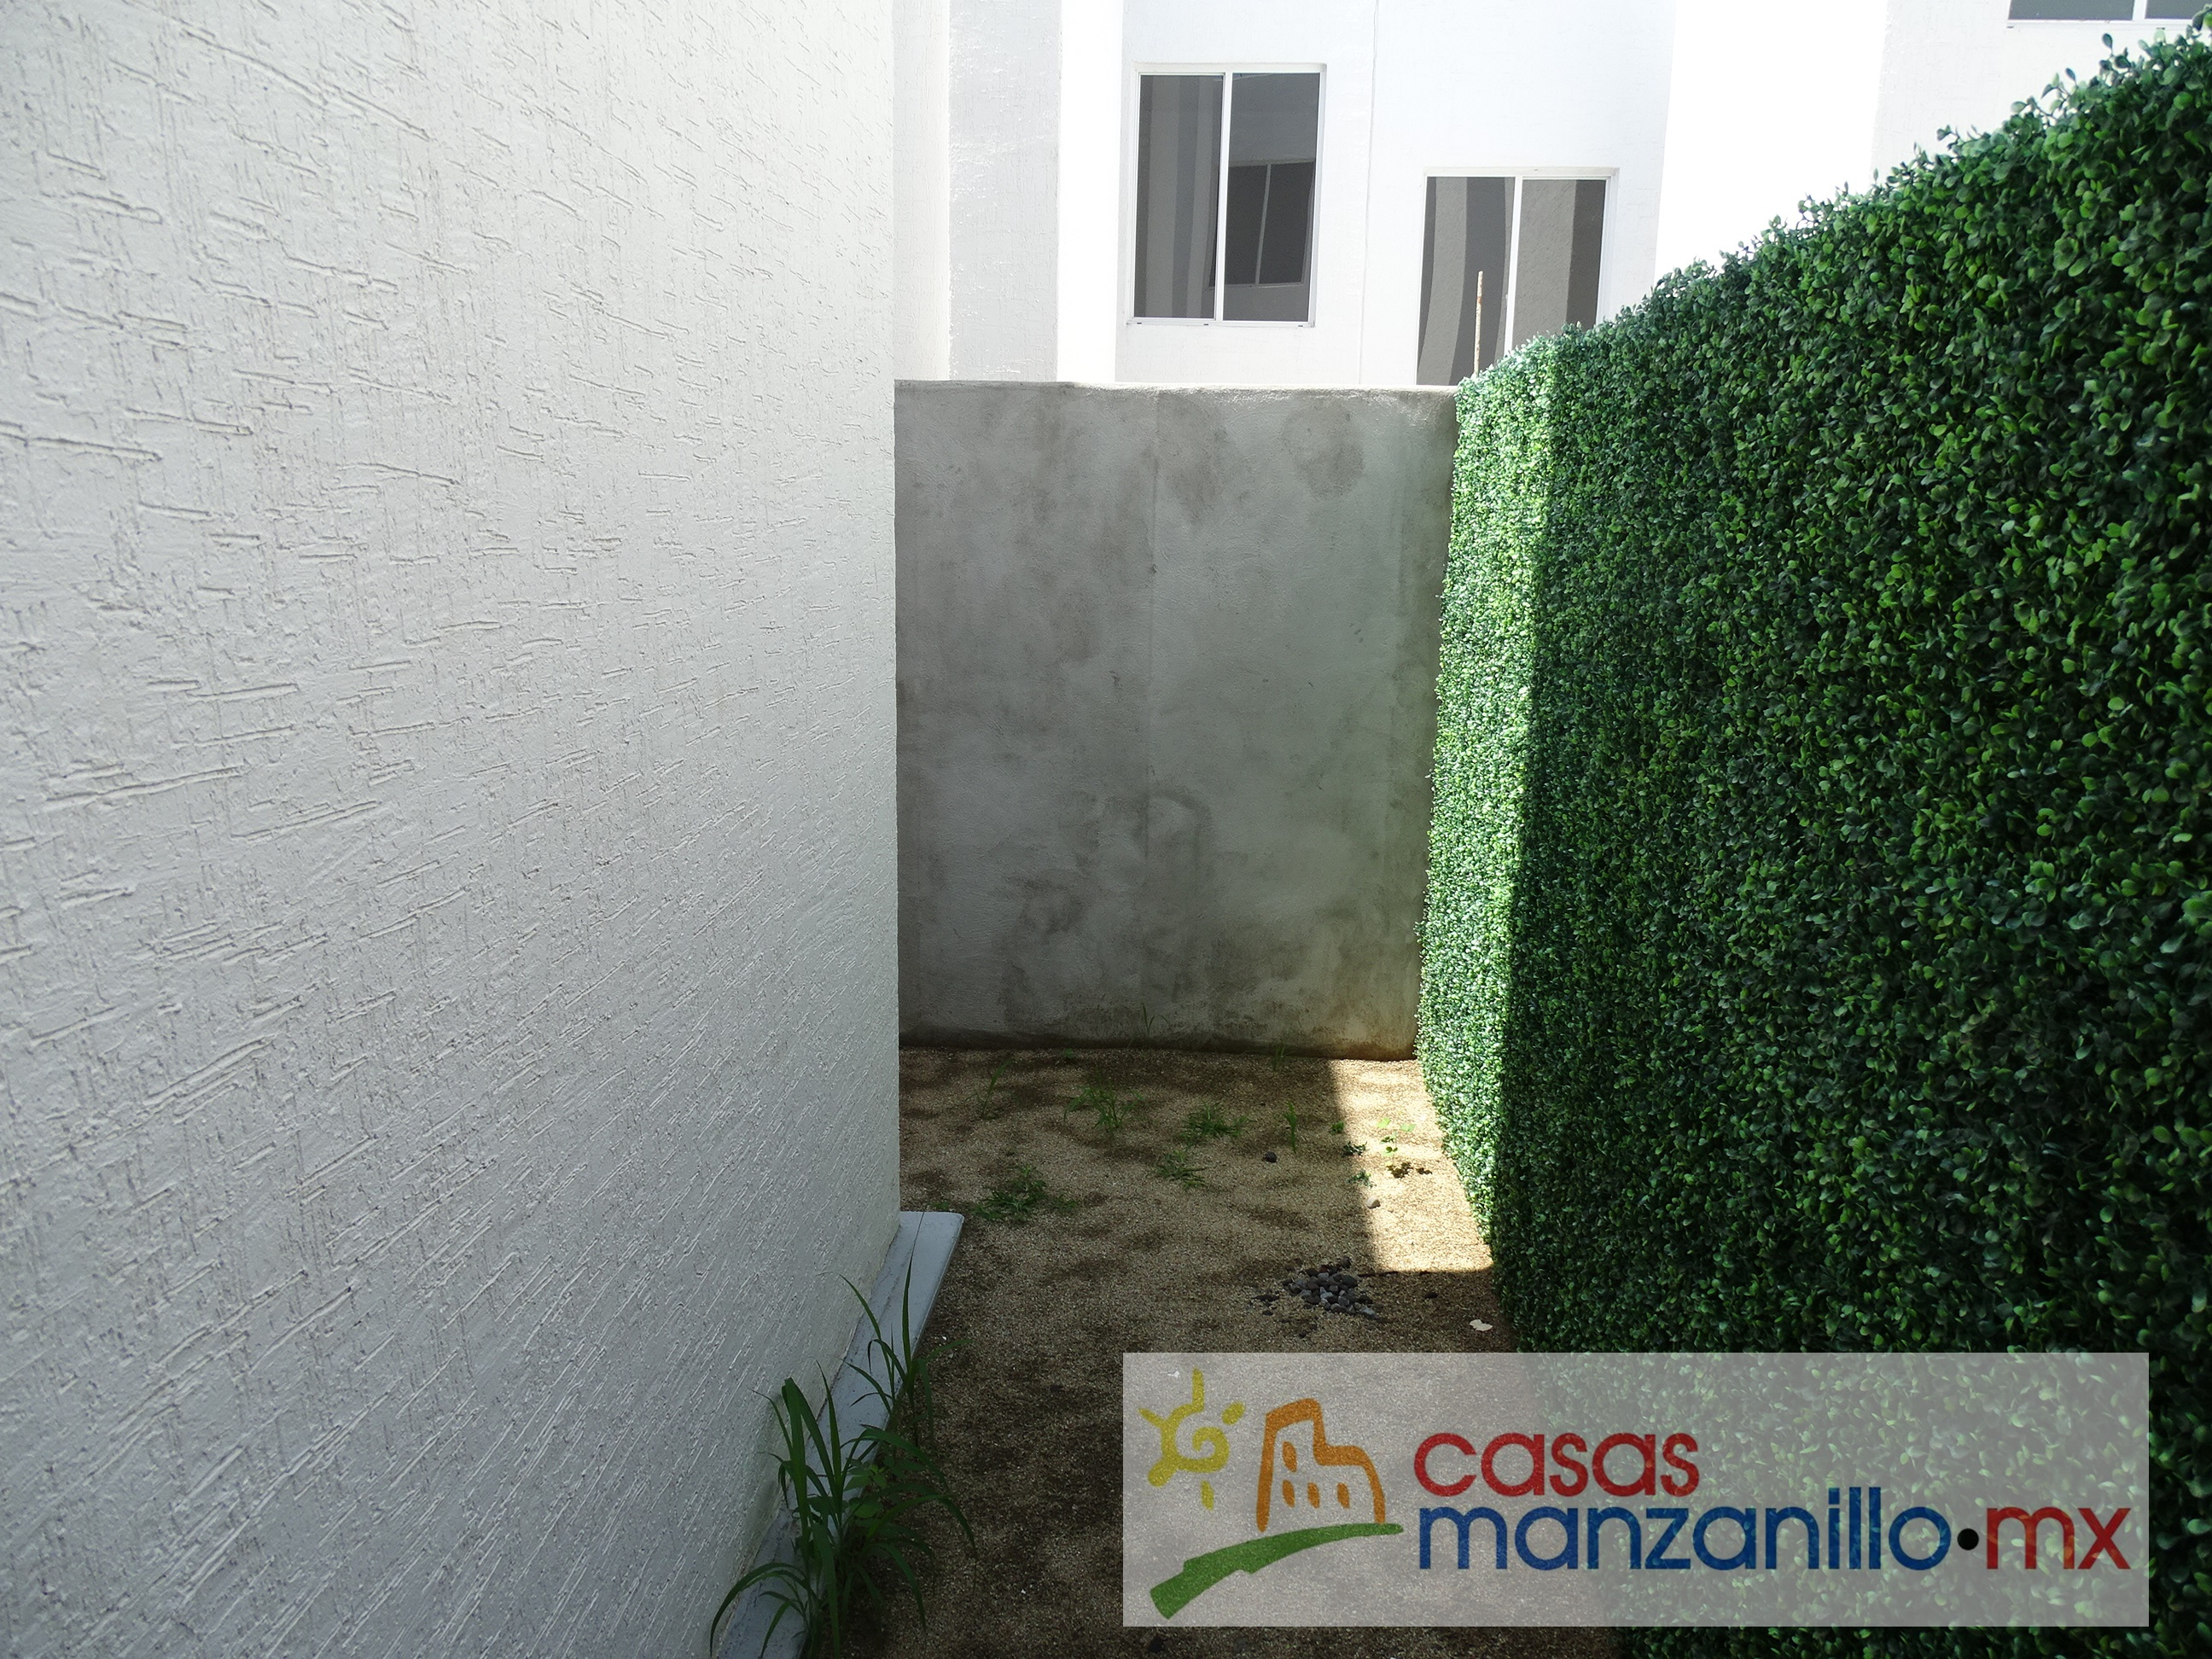 Casas Venta Manzanillo - Lomas del Carmen (12)